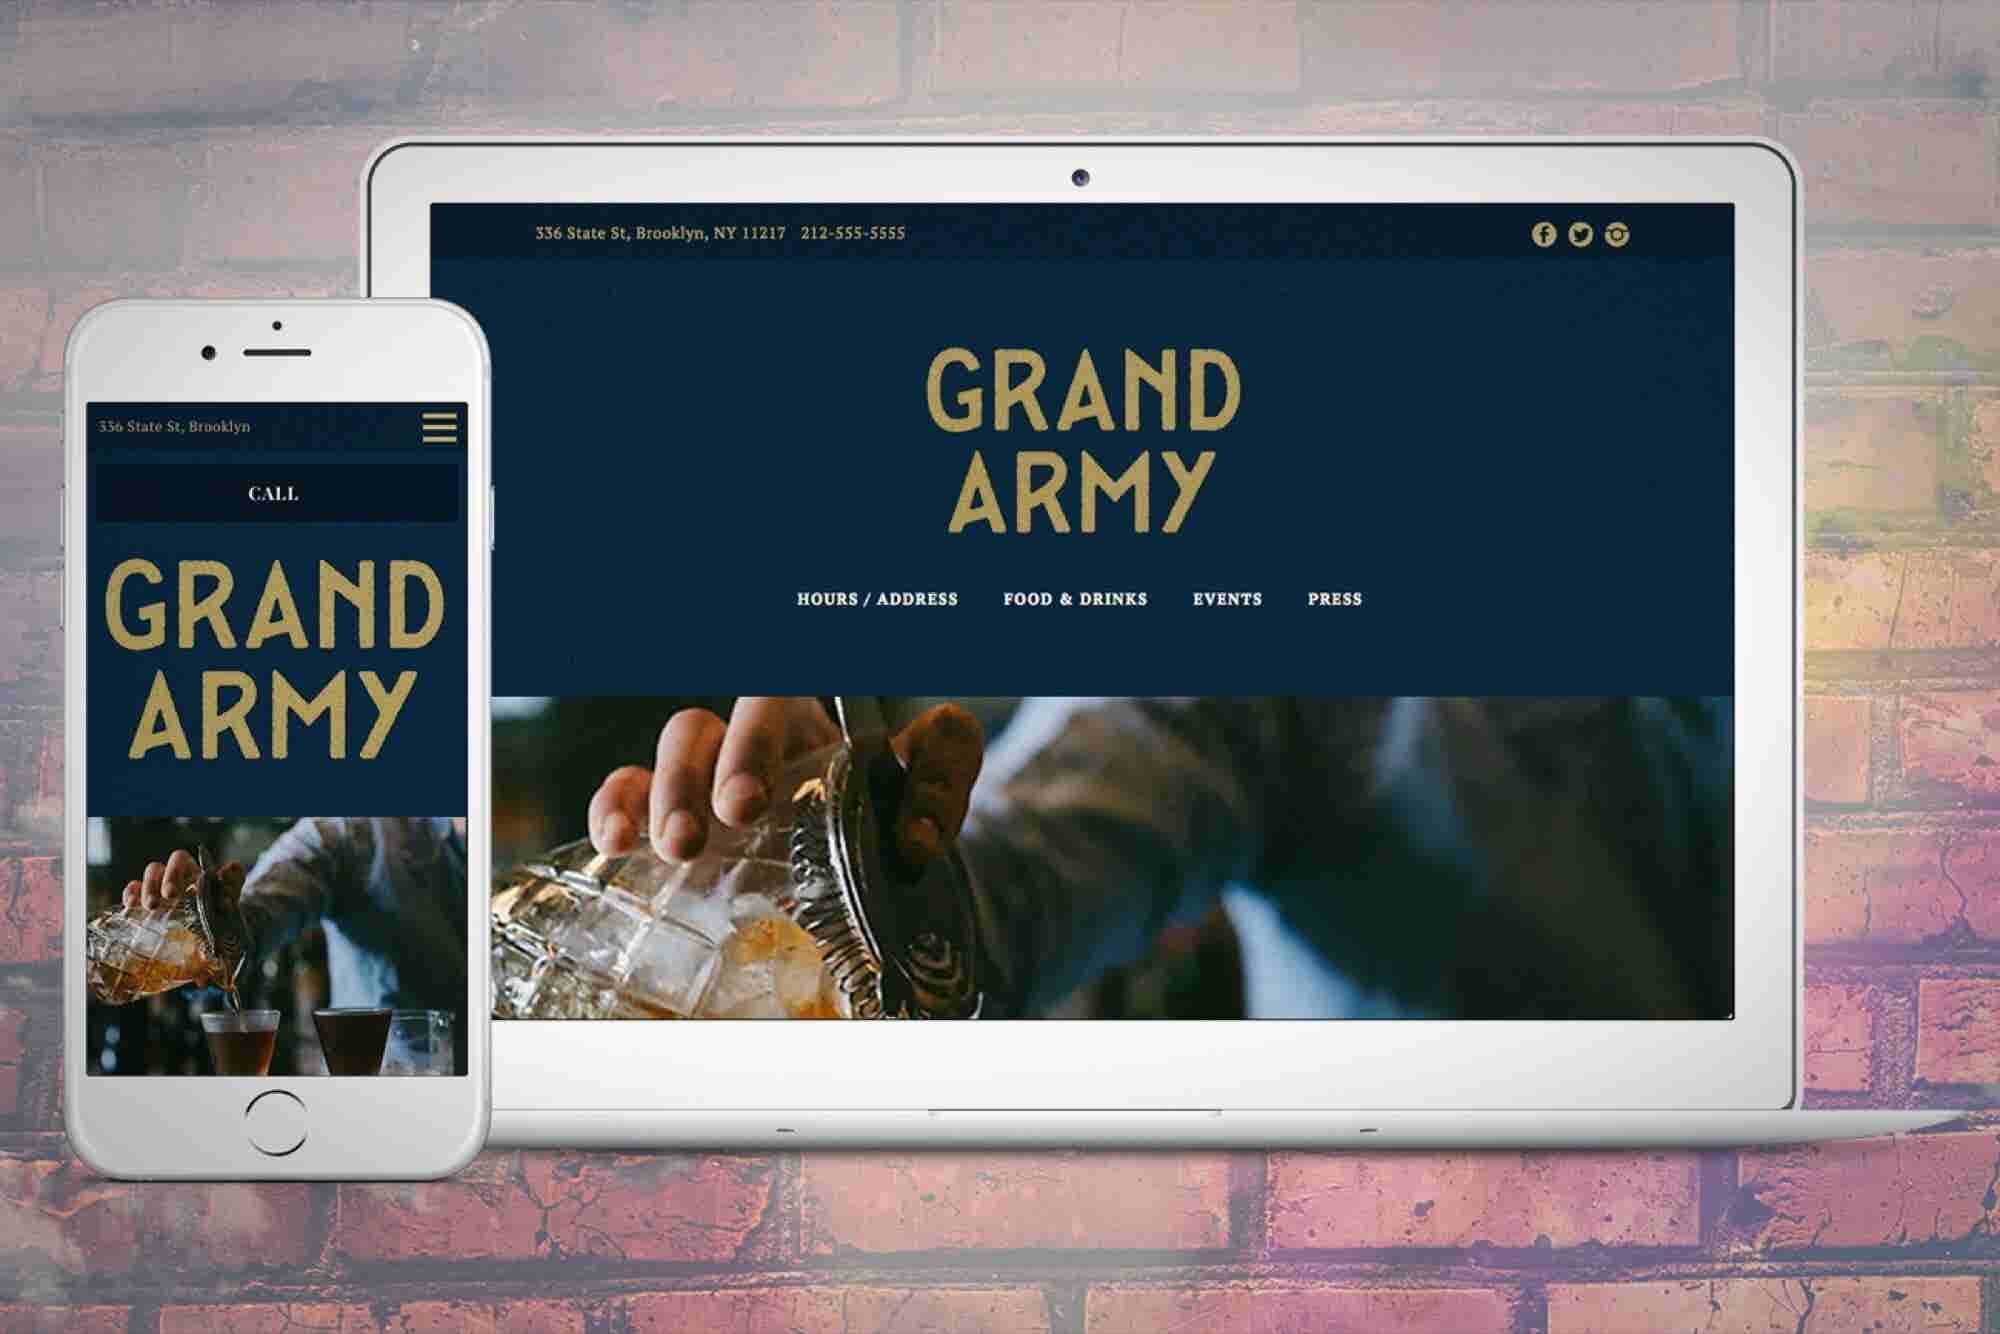 How BentoBox Is Ending the Era of Badly Designed Restaurant Websites